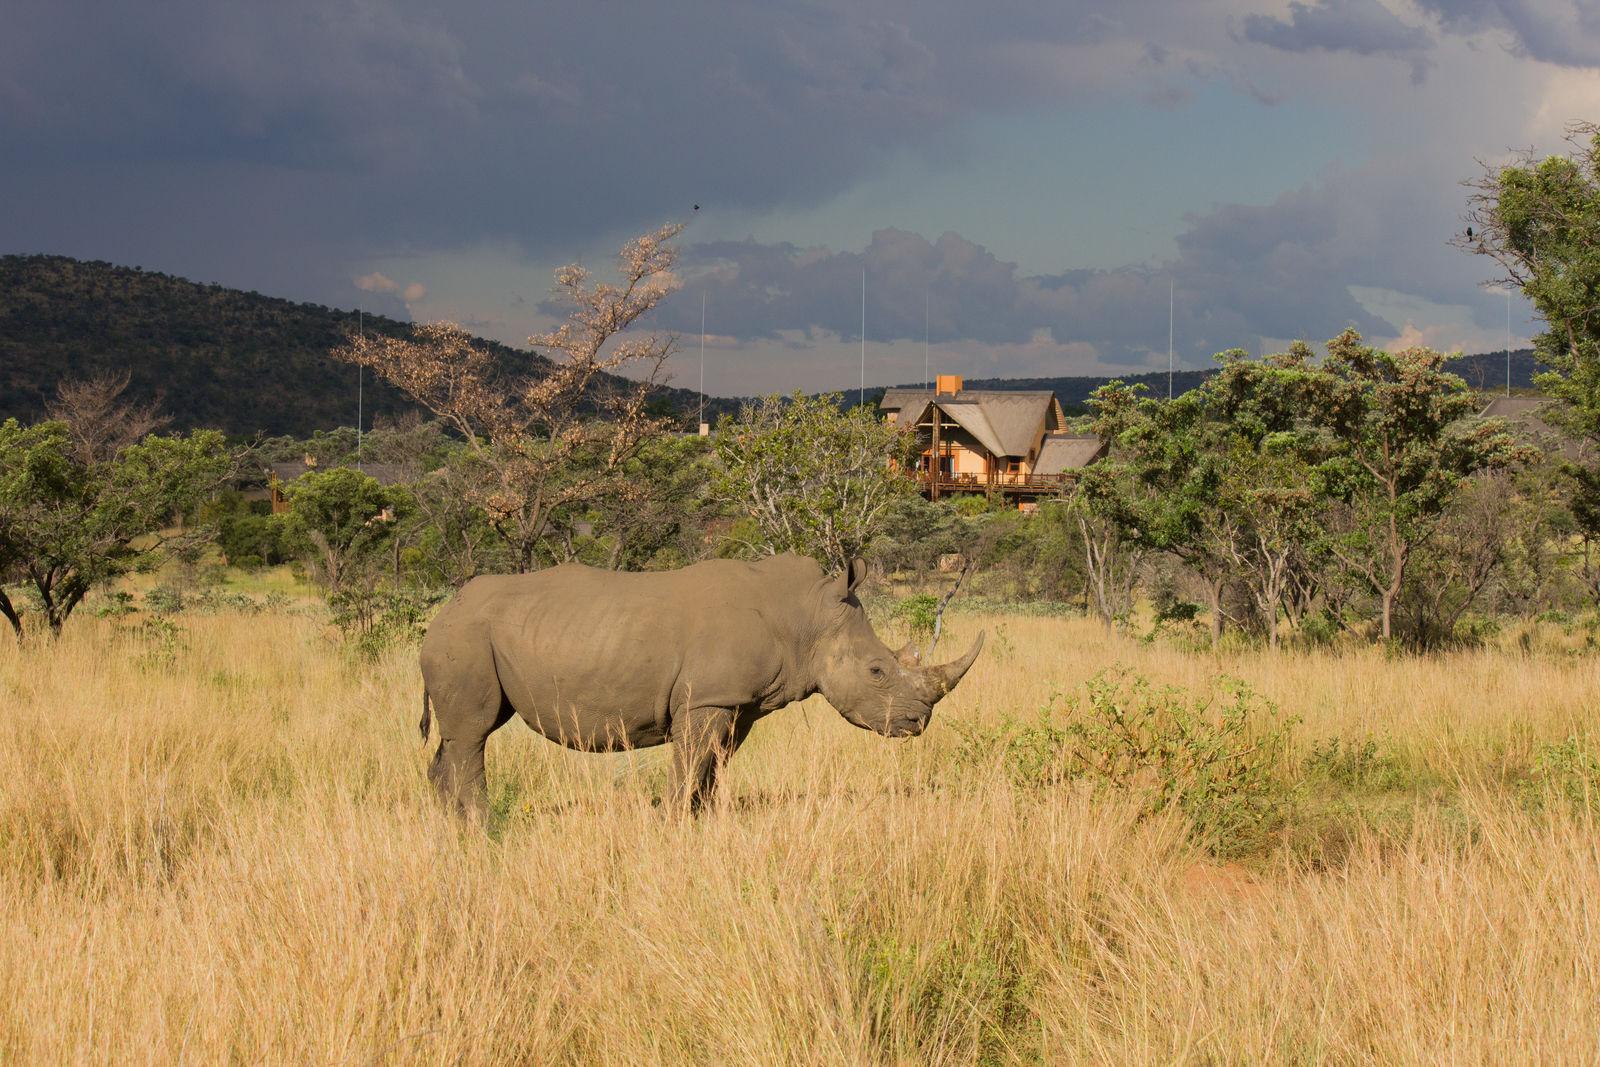 17-daagse rondreis Zuid-Afrika: kies! | AmbianceTravel